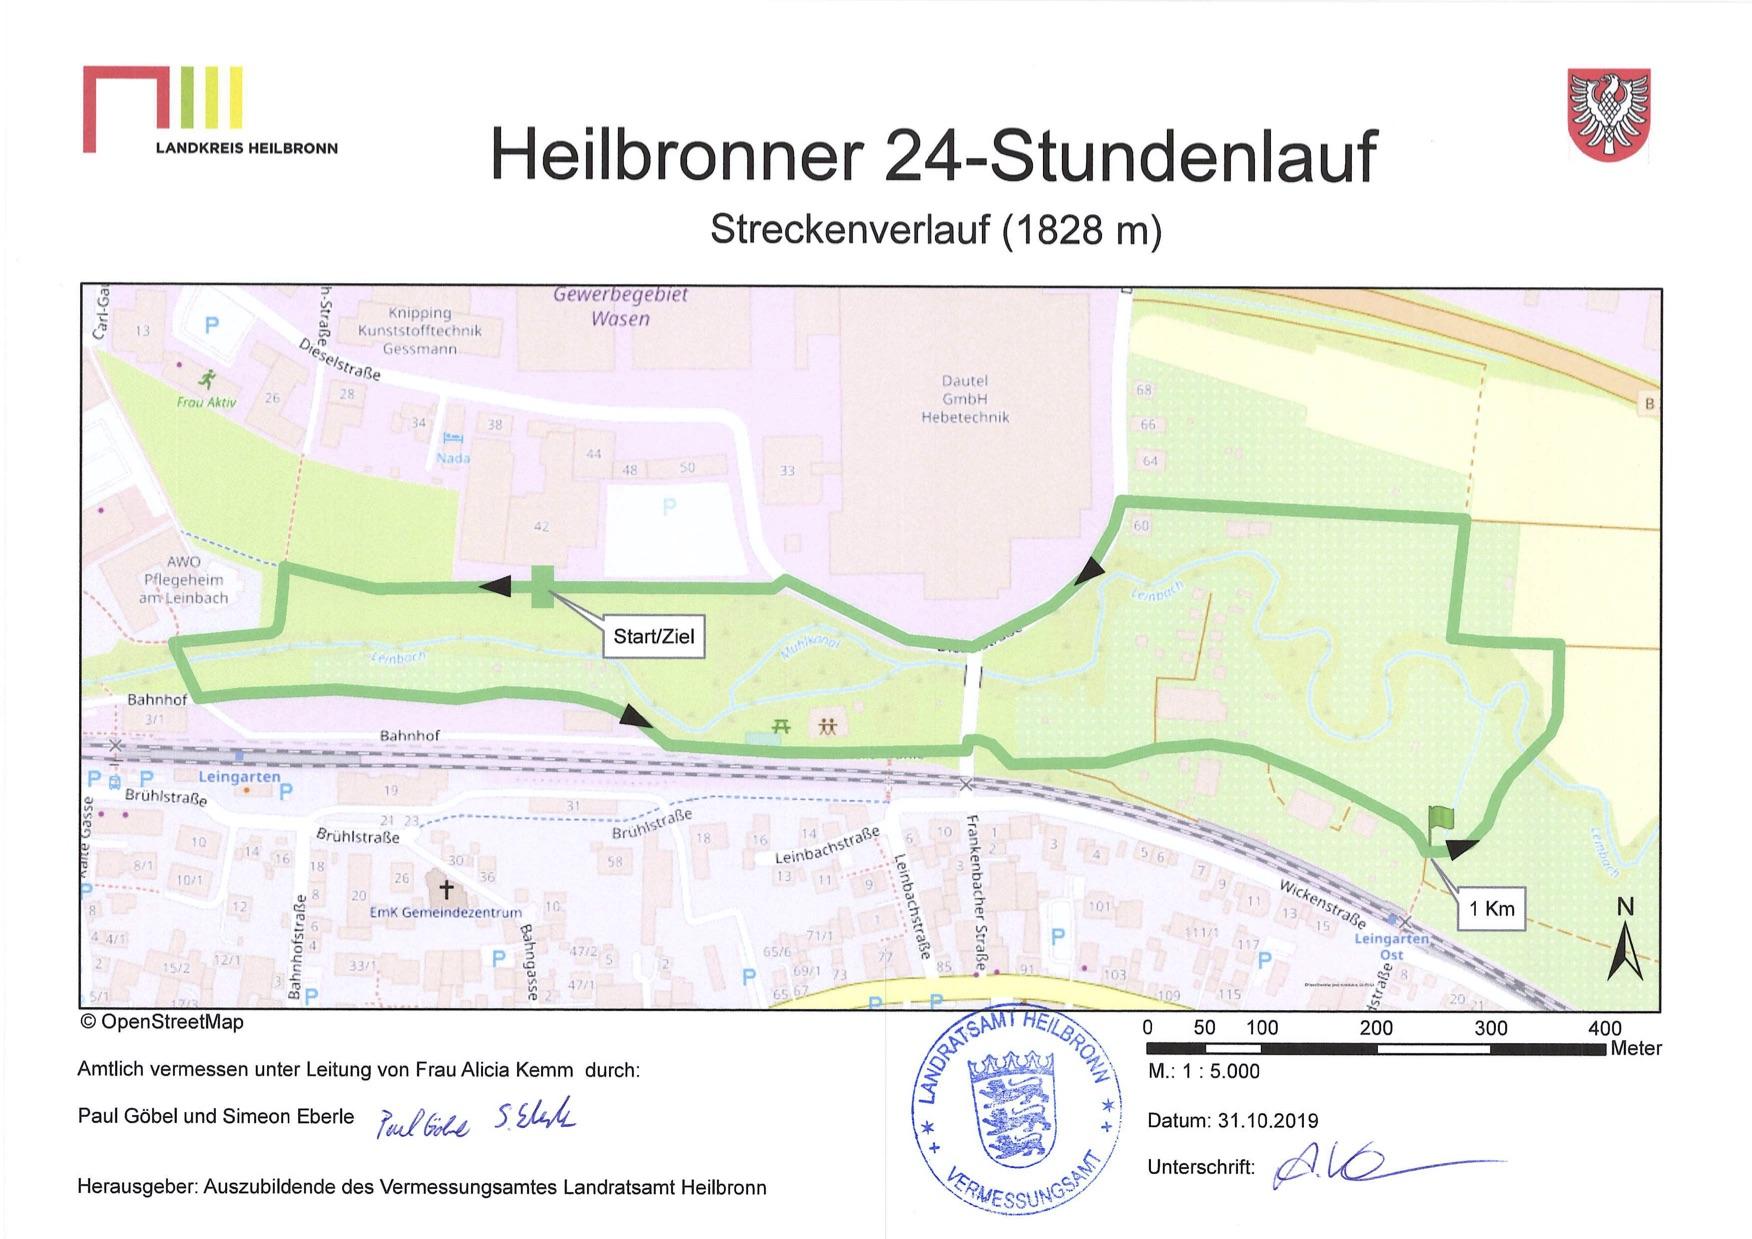 Heilbronner 24-Stundenlauf_Laufstrecke original Stadt Heilbronn